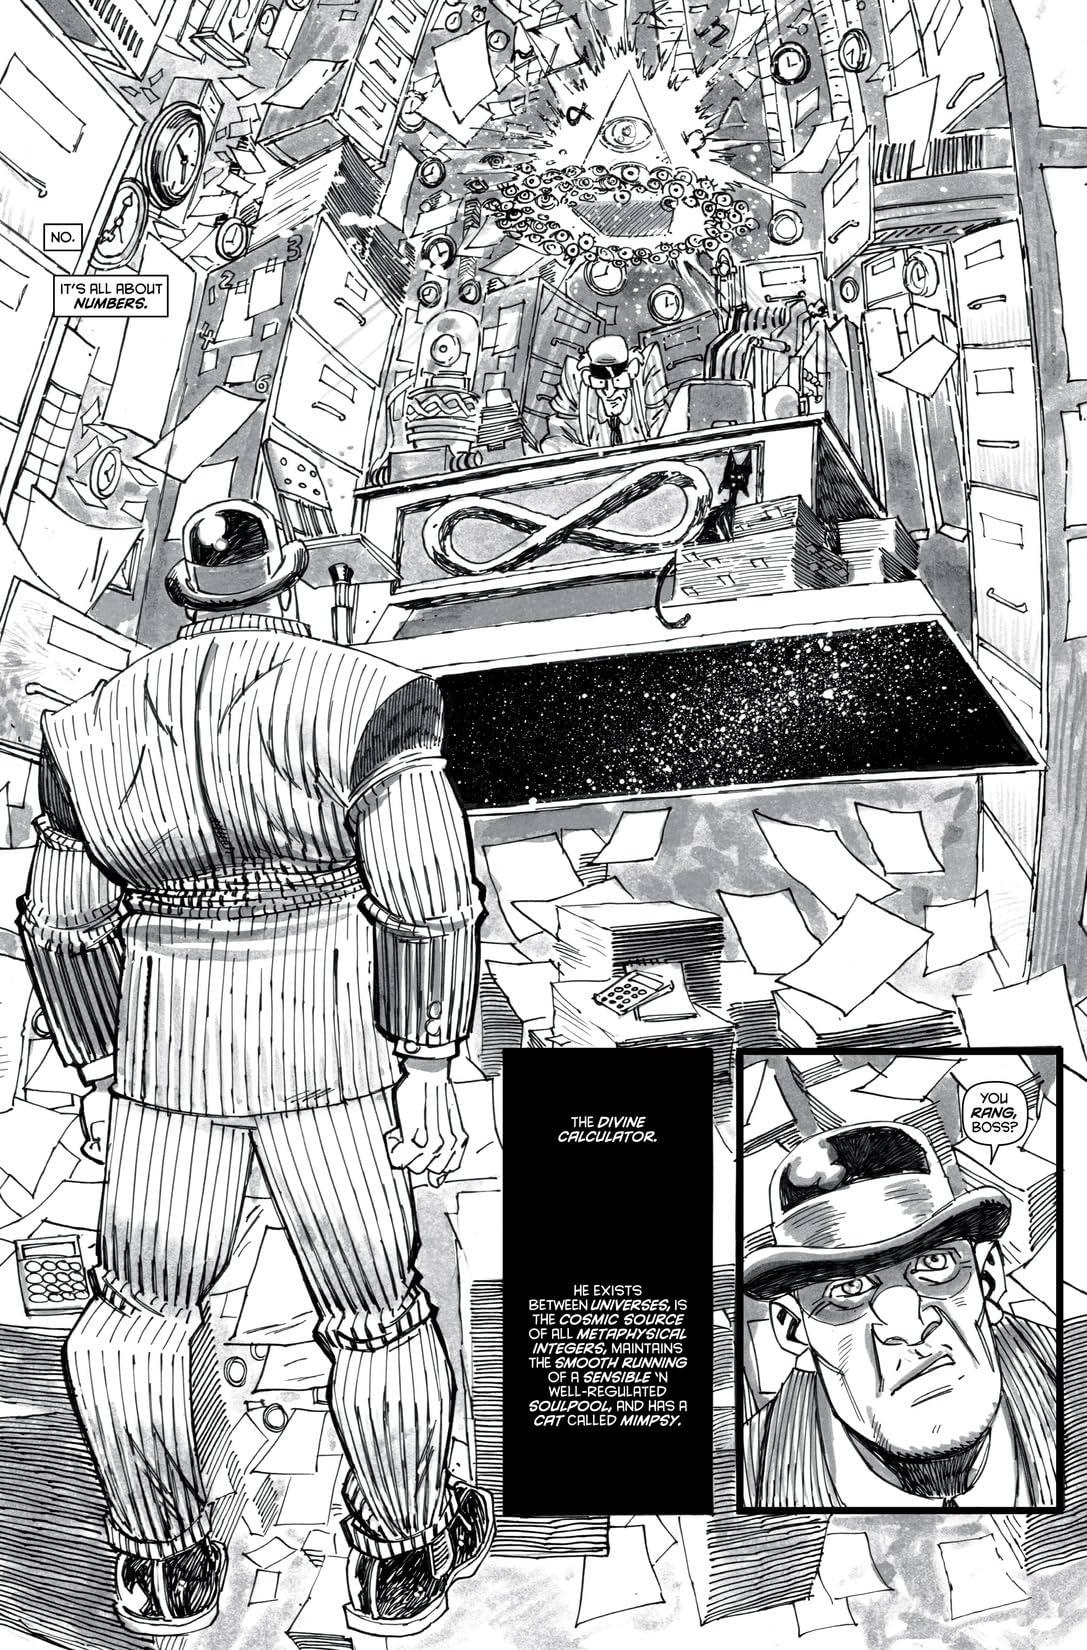 Numbercruncher Vol. 1